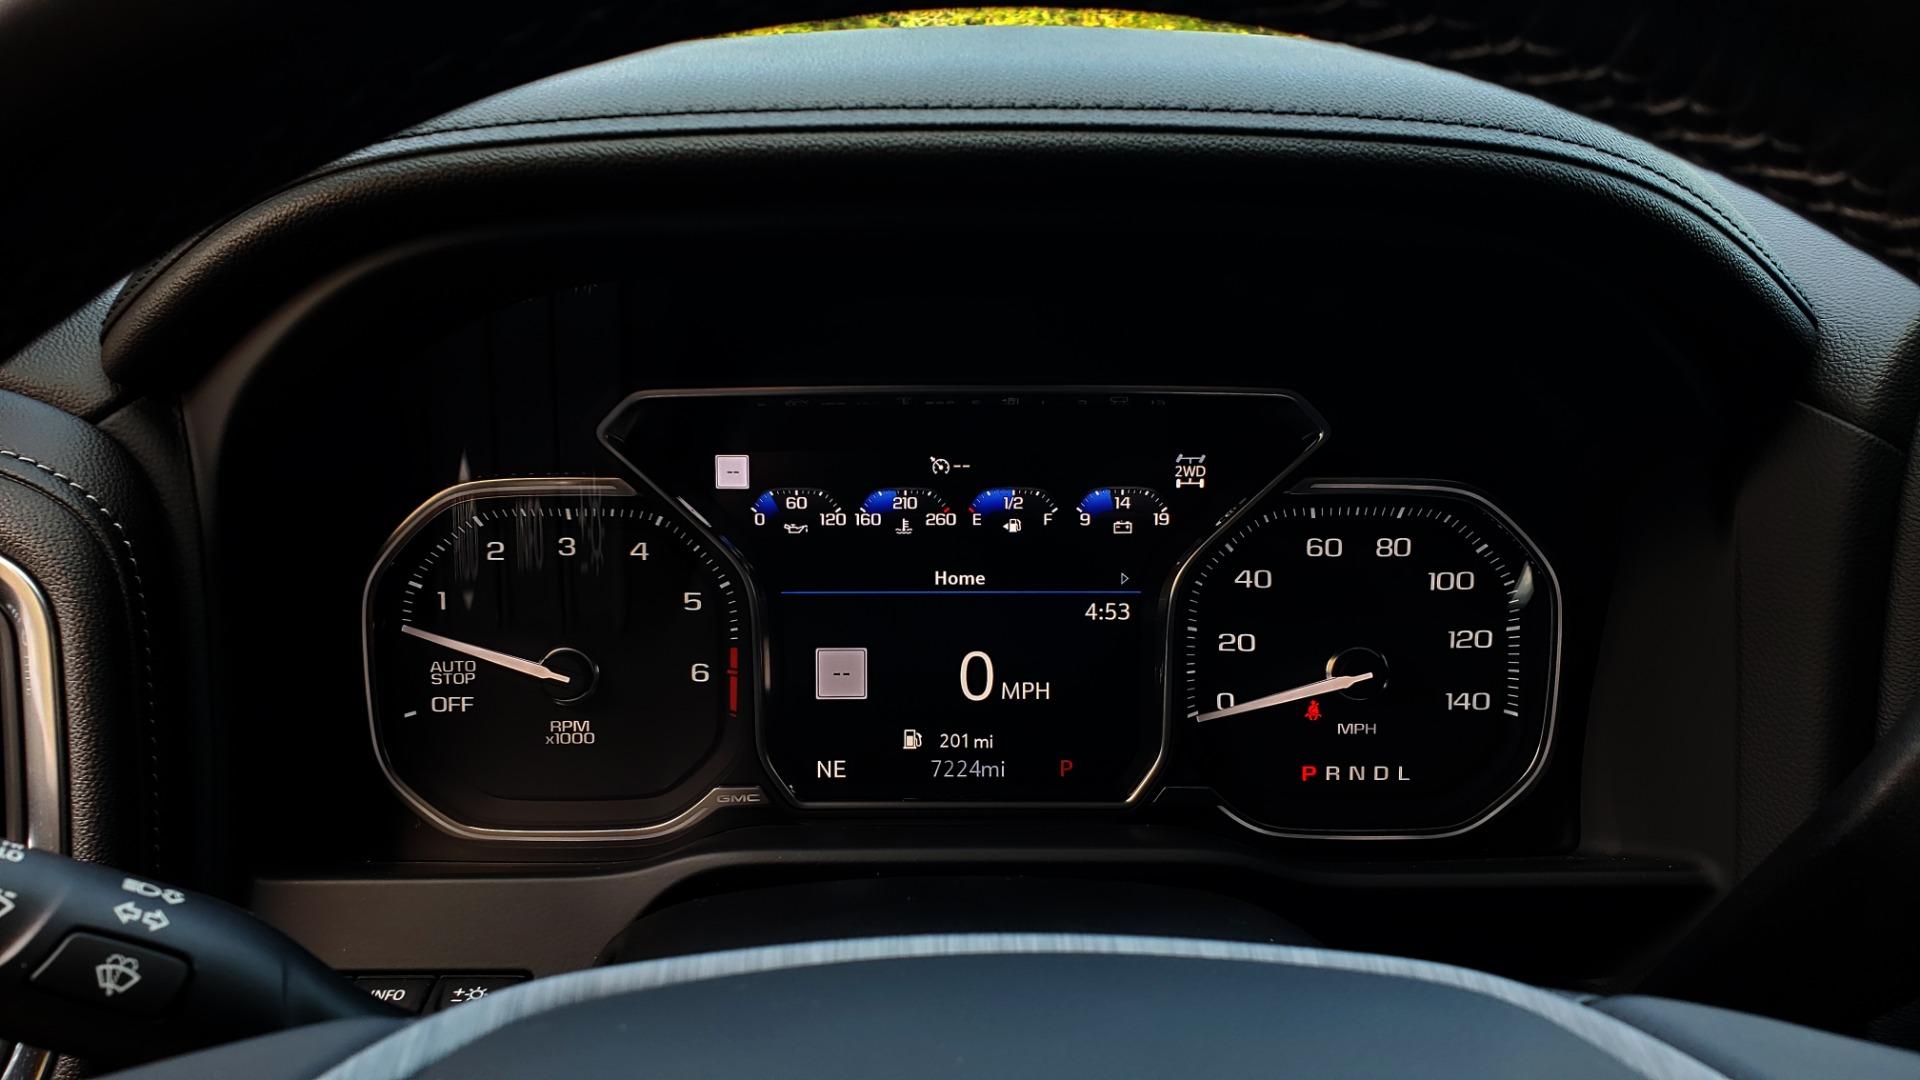 Used 2019 GMC SIERRA 1500 DENALI ULTIMATE 4WD / NAV / TECH PKG / DRVR ALRT for sale Sold at Formula Imports in Charlotte NC 28227 49